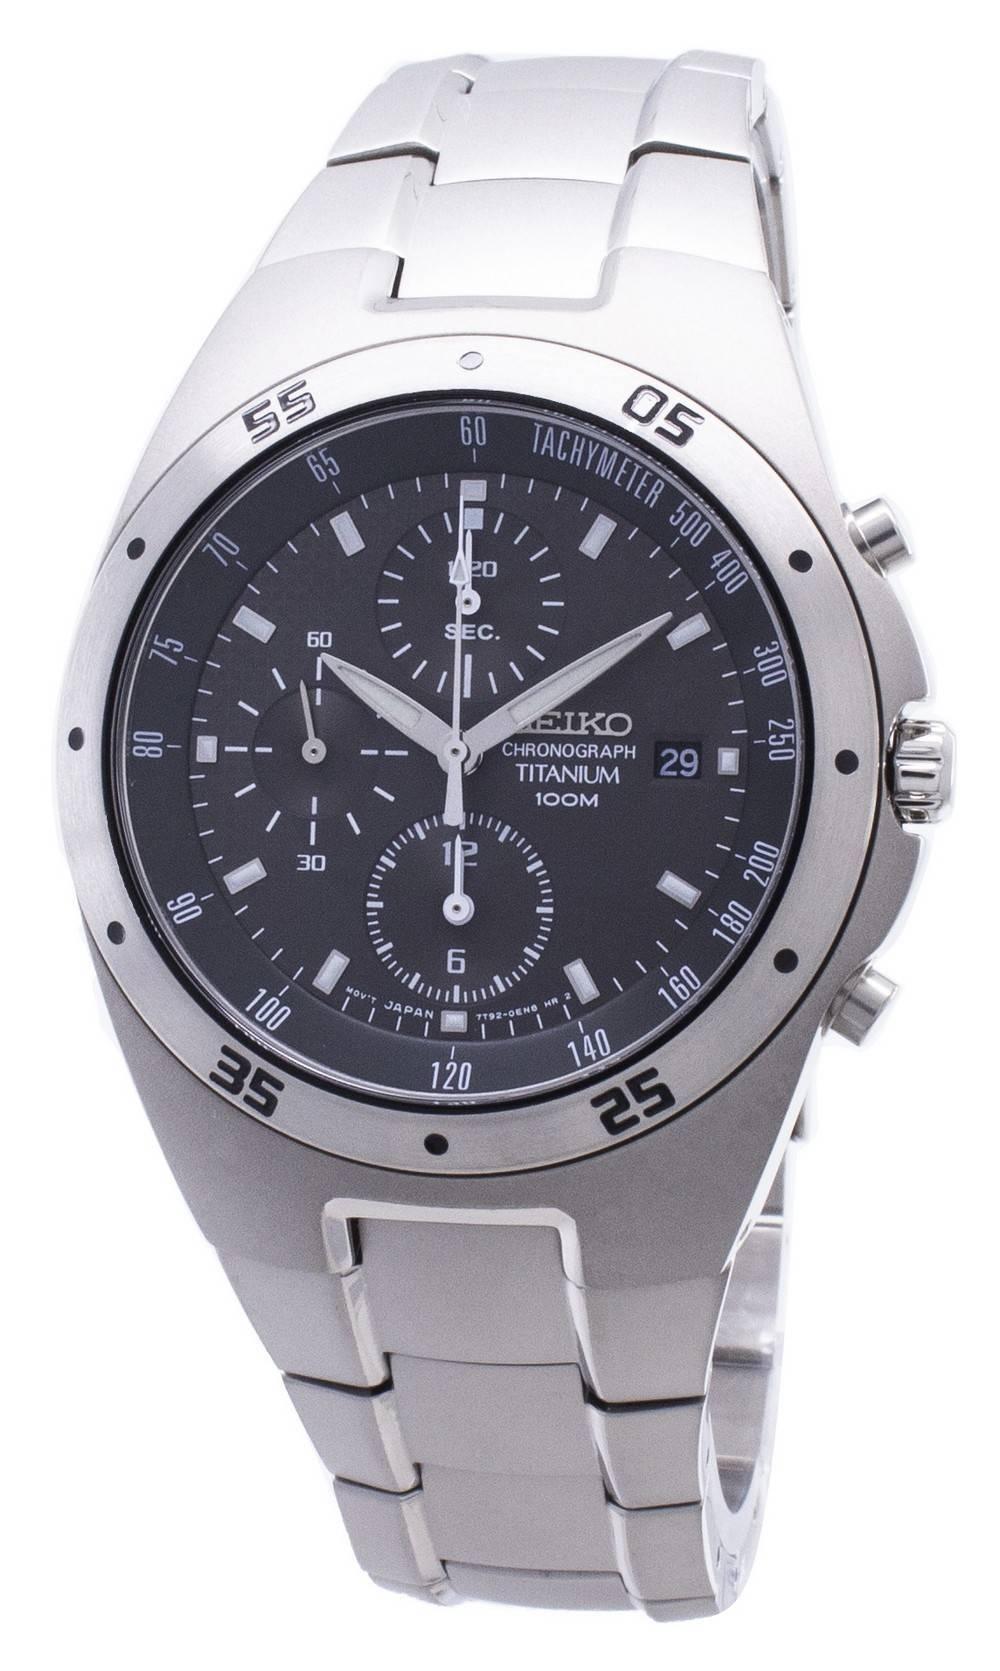 6513cd2db02 Seiko Titanium Chronograph SND419P1 SND419P SND419 Men s Watch ...